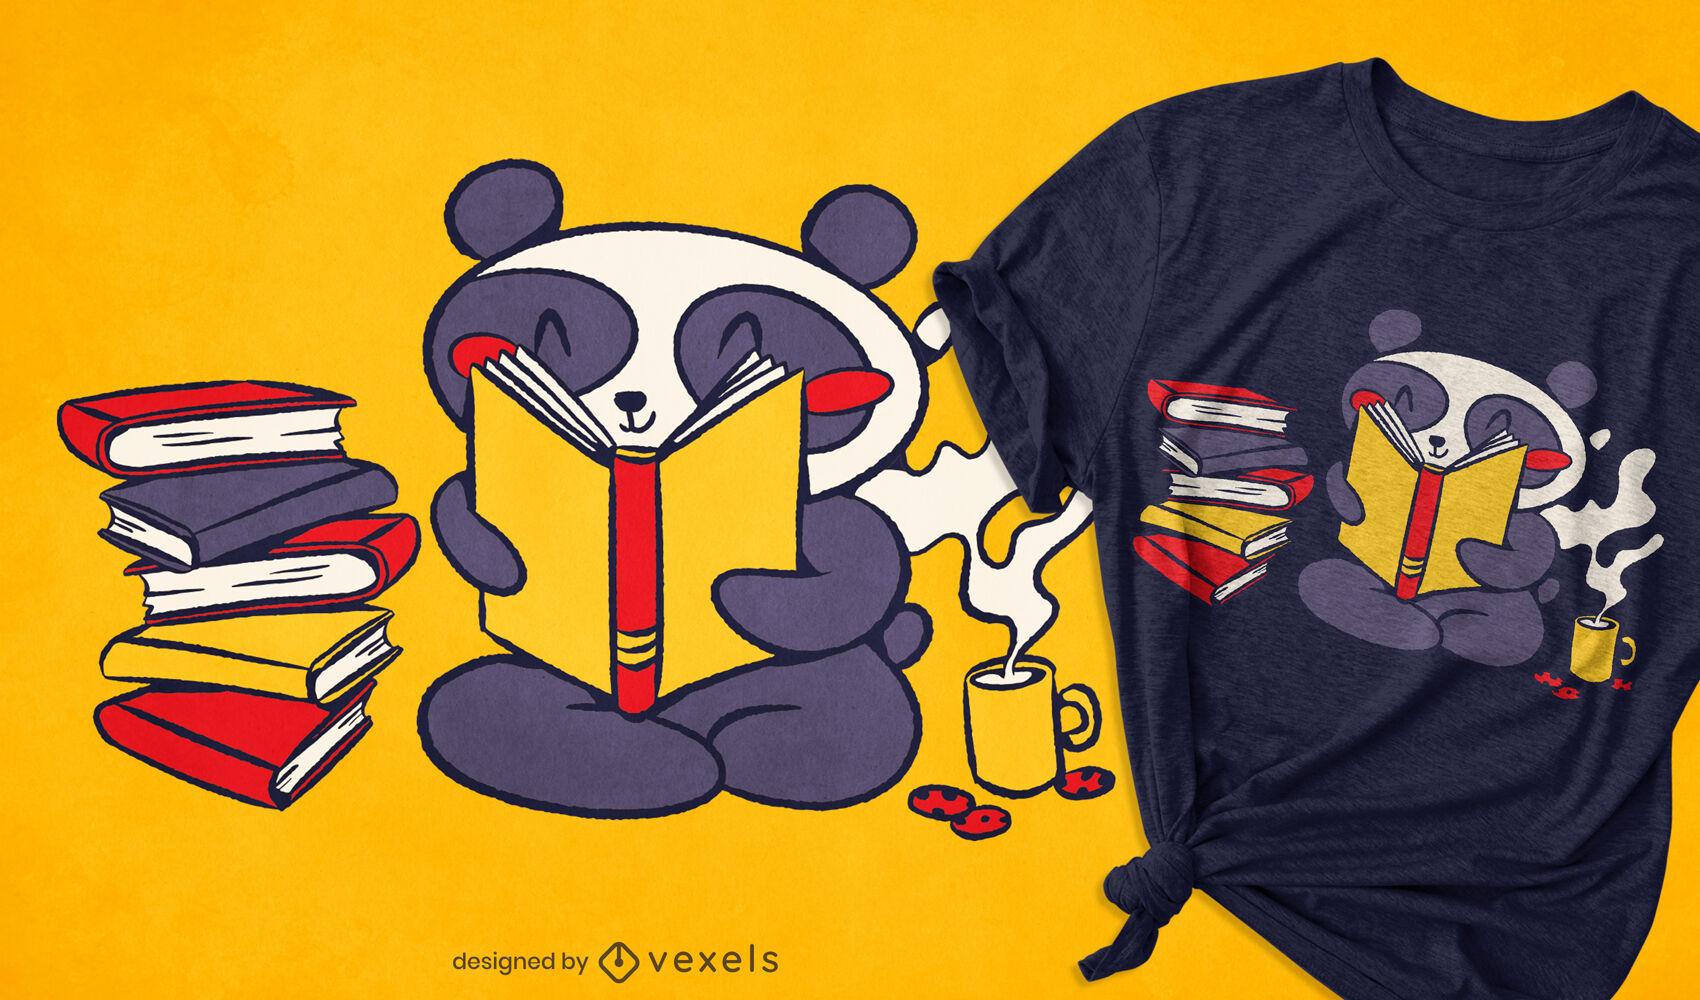 Panda-Lese-T-Shirt-Design